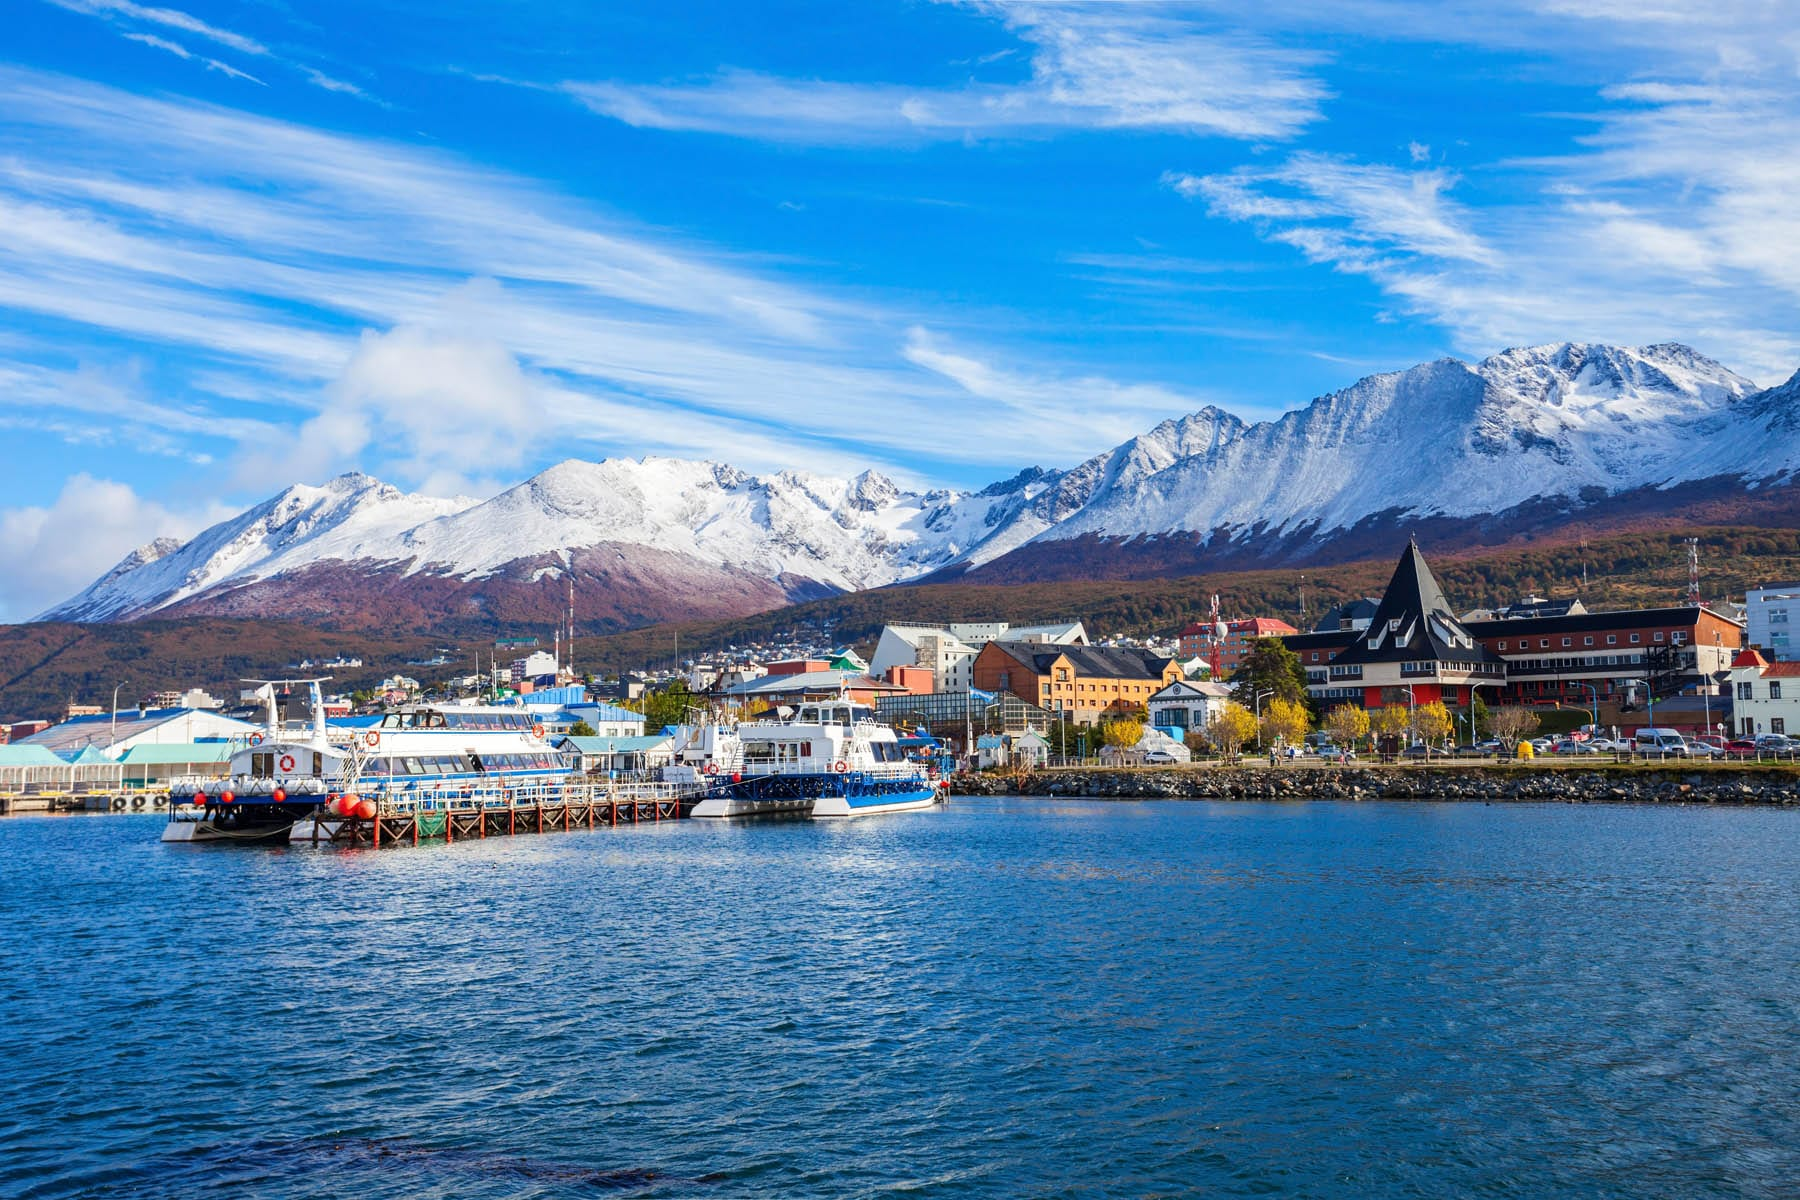 In Patagonia - Ushuaia